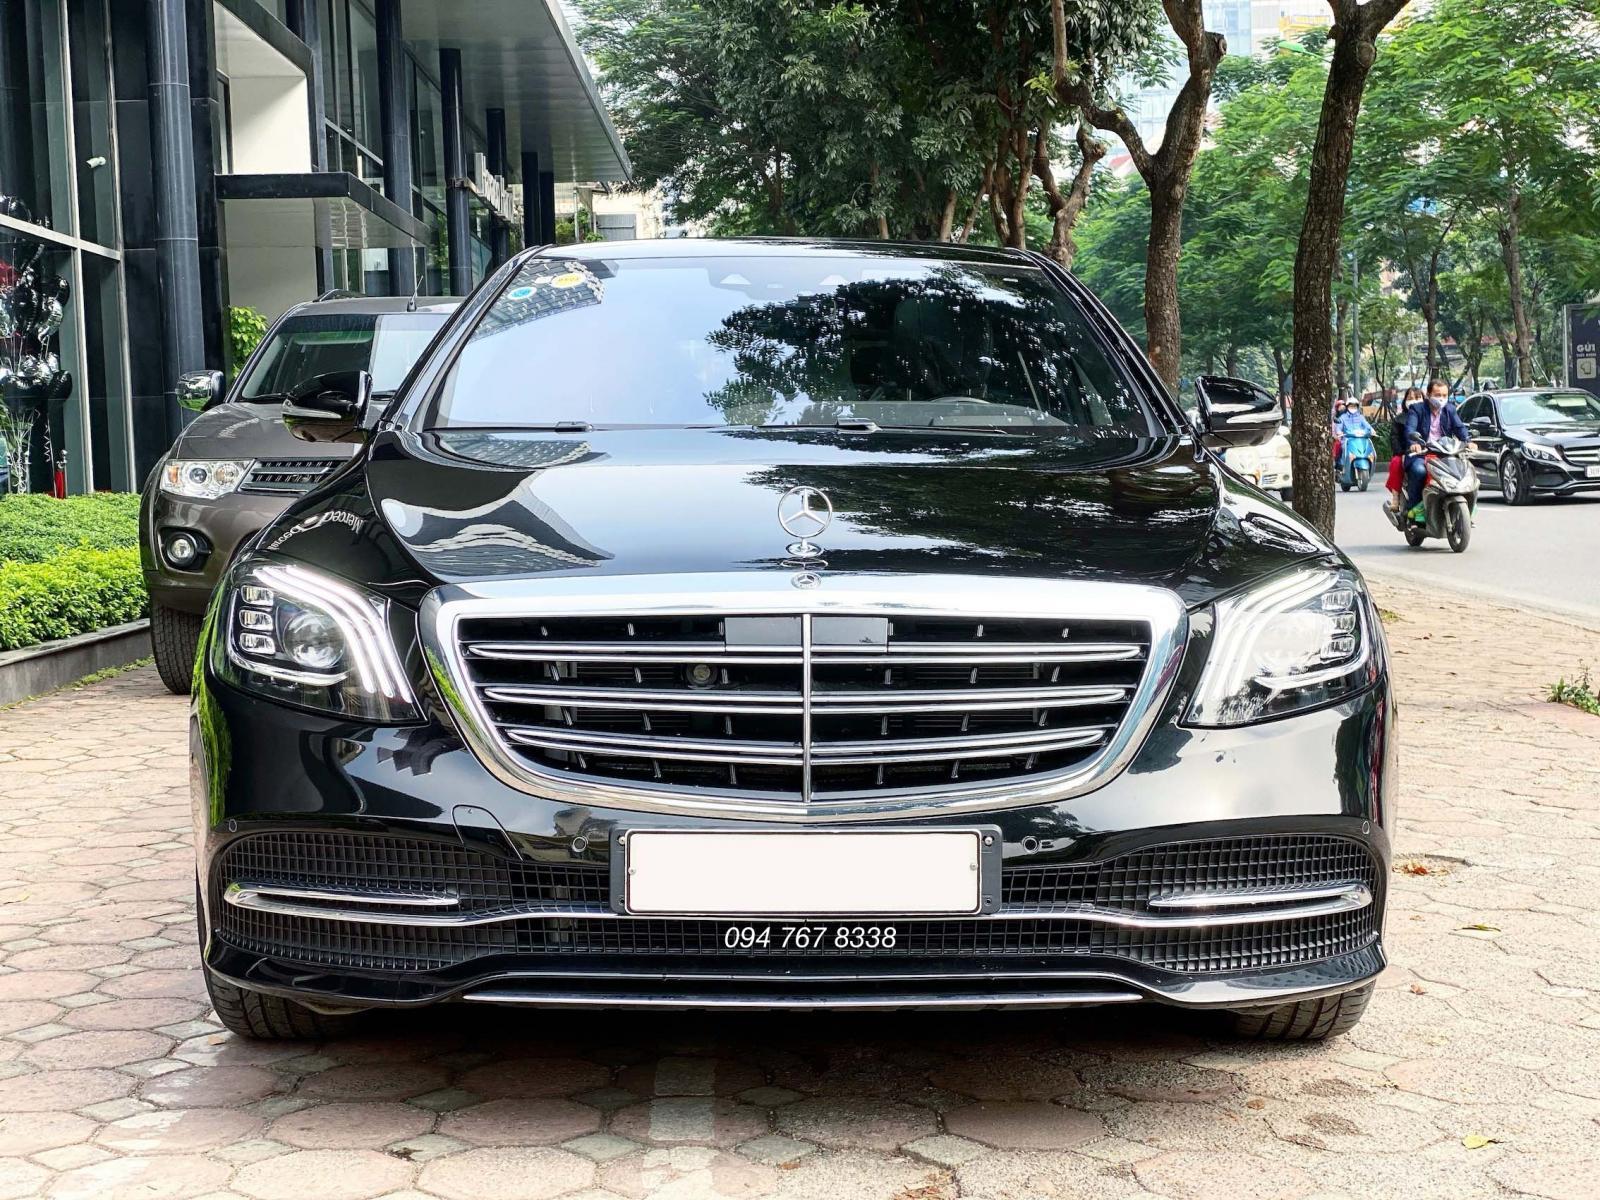 Bán Mercedes S450 Luxury năm 2020, màu đen